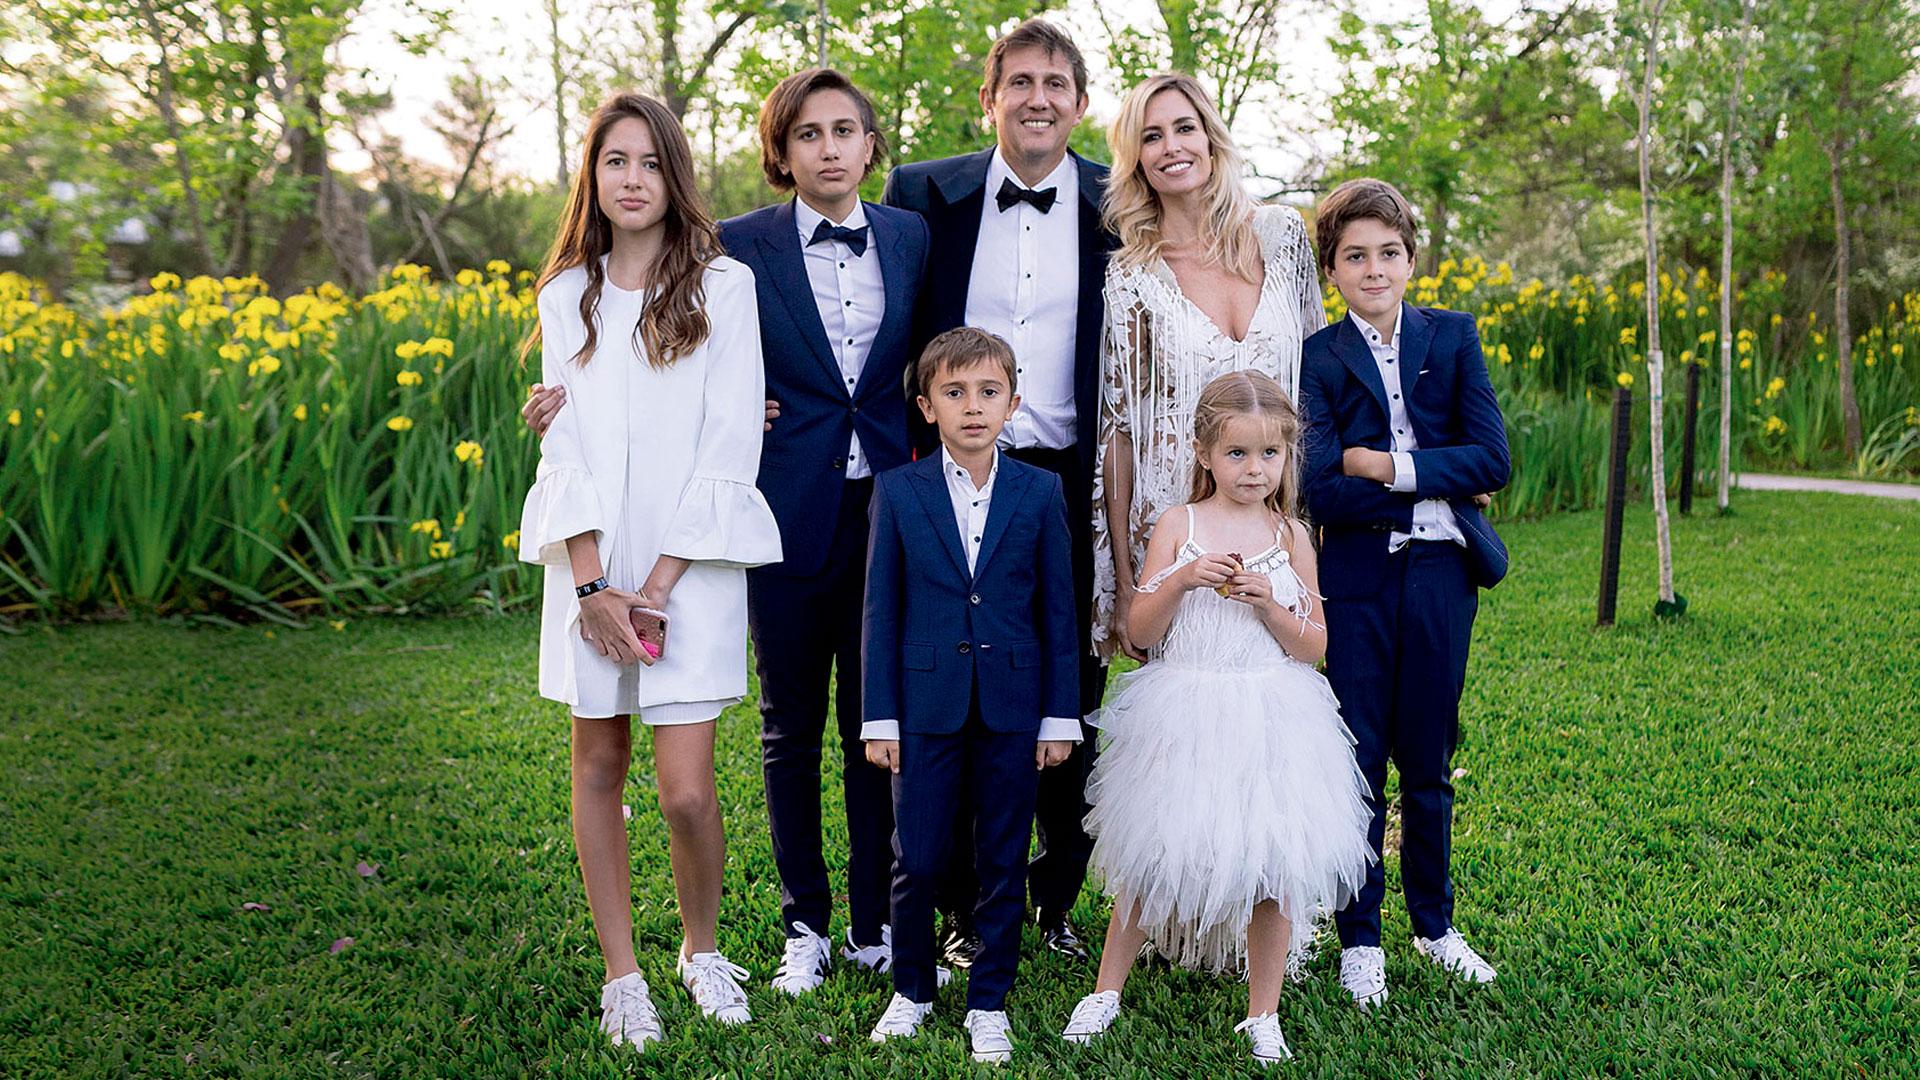 La familia ensamblada: Juana (13), Valentín (14), Juan Pablo Varsky (46), María Laura Bruzoni (40), Felipe (9), Benjamín (8) e Isabel (5).